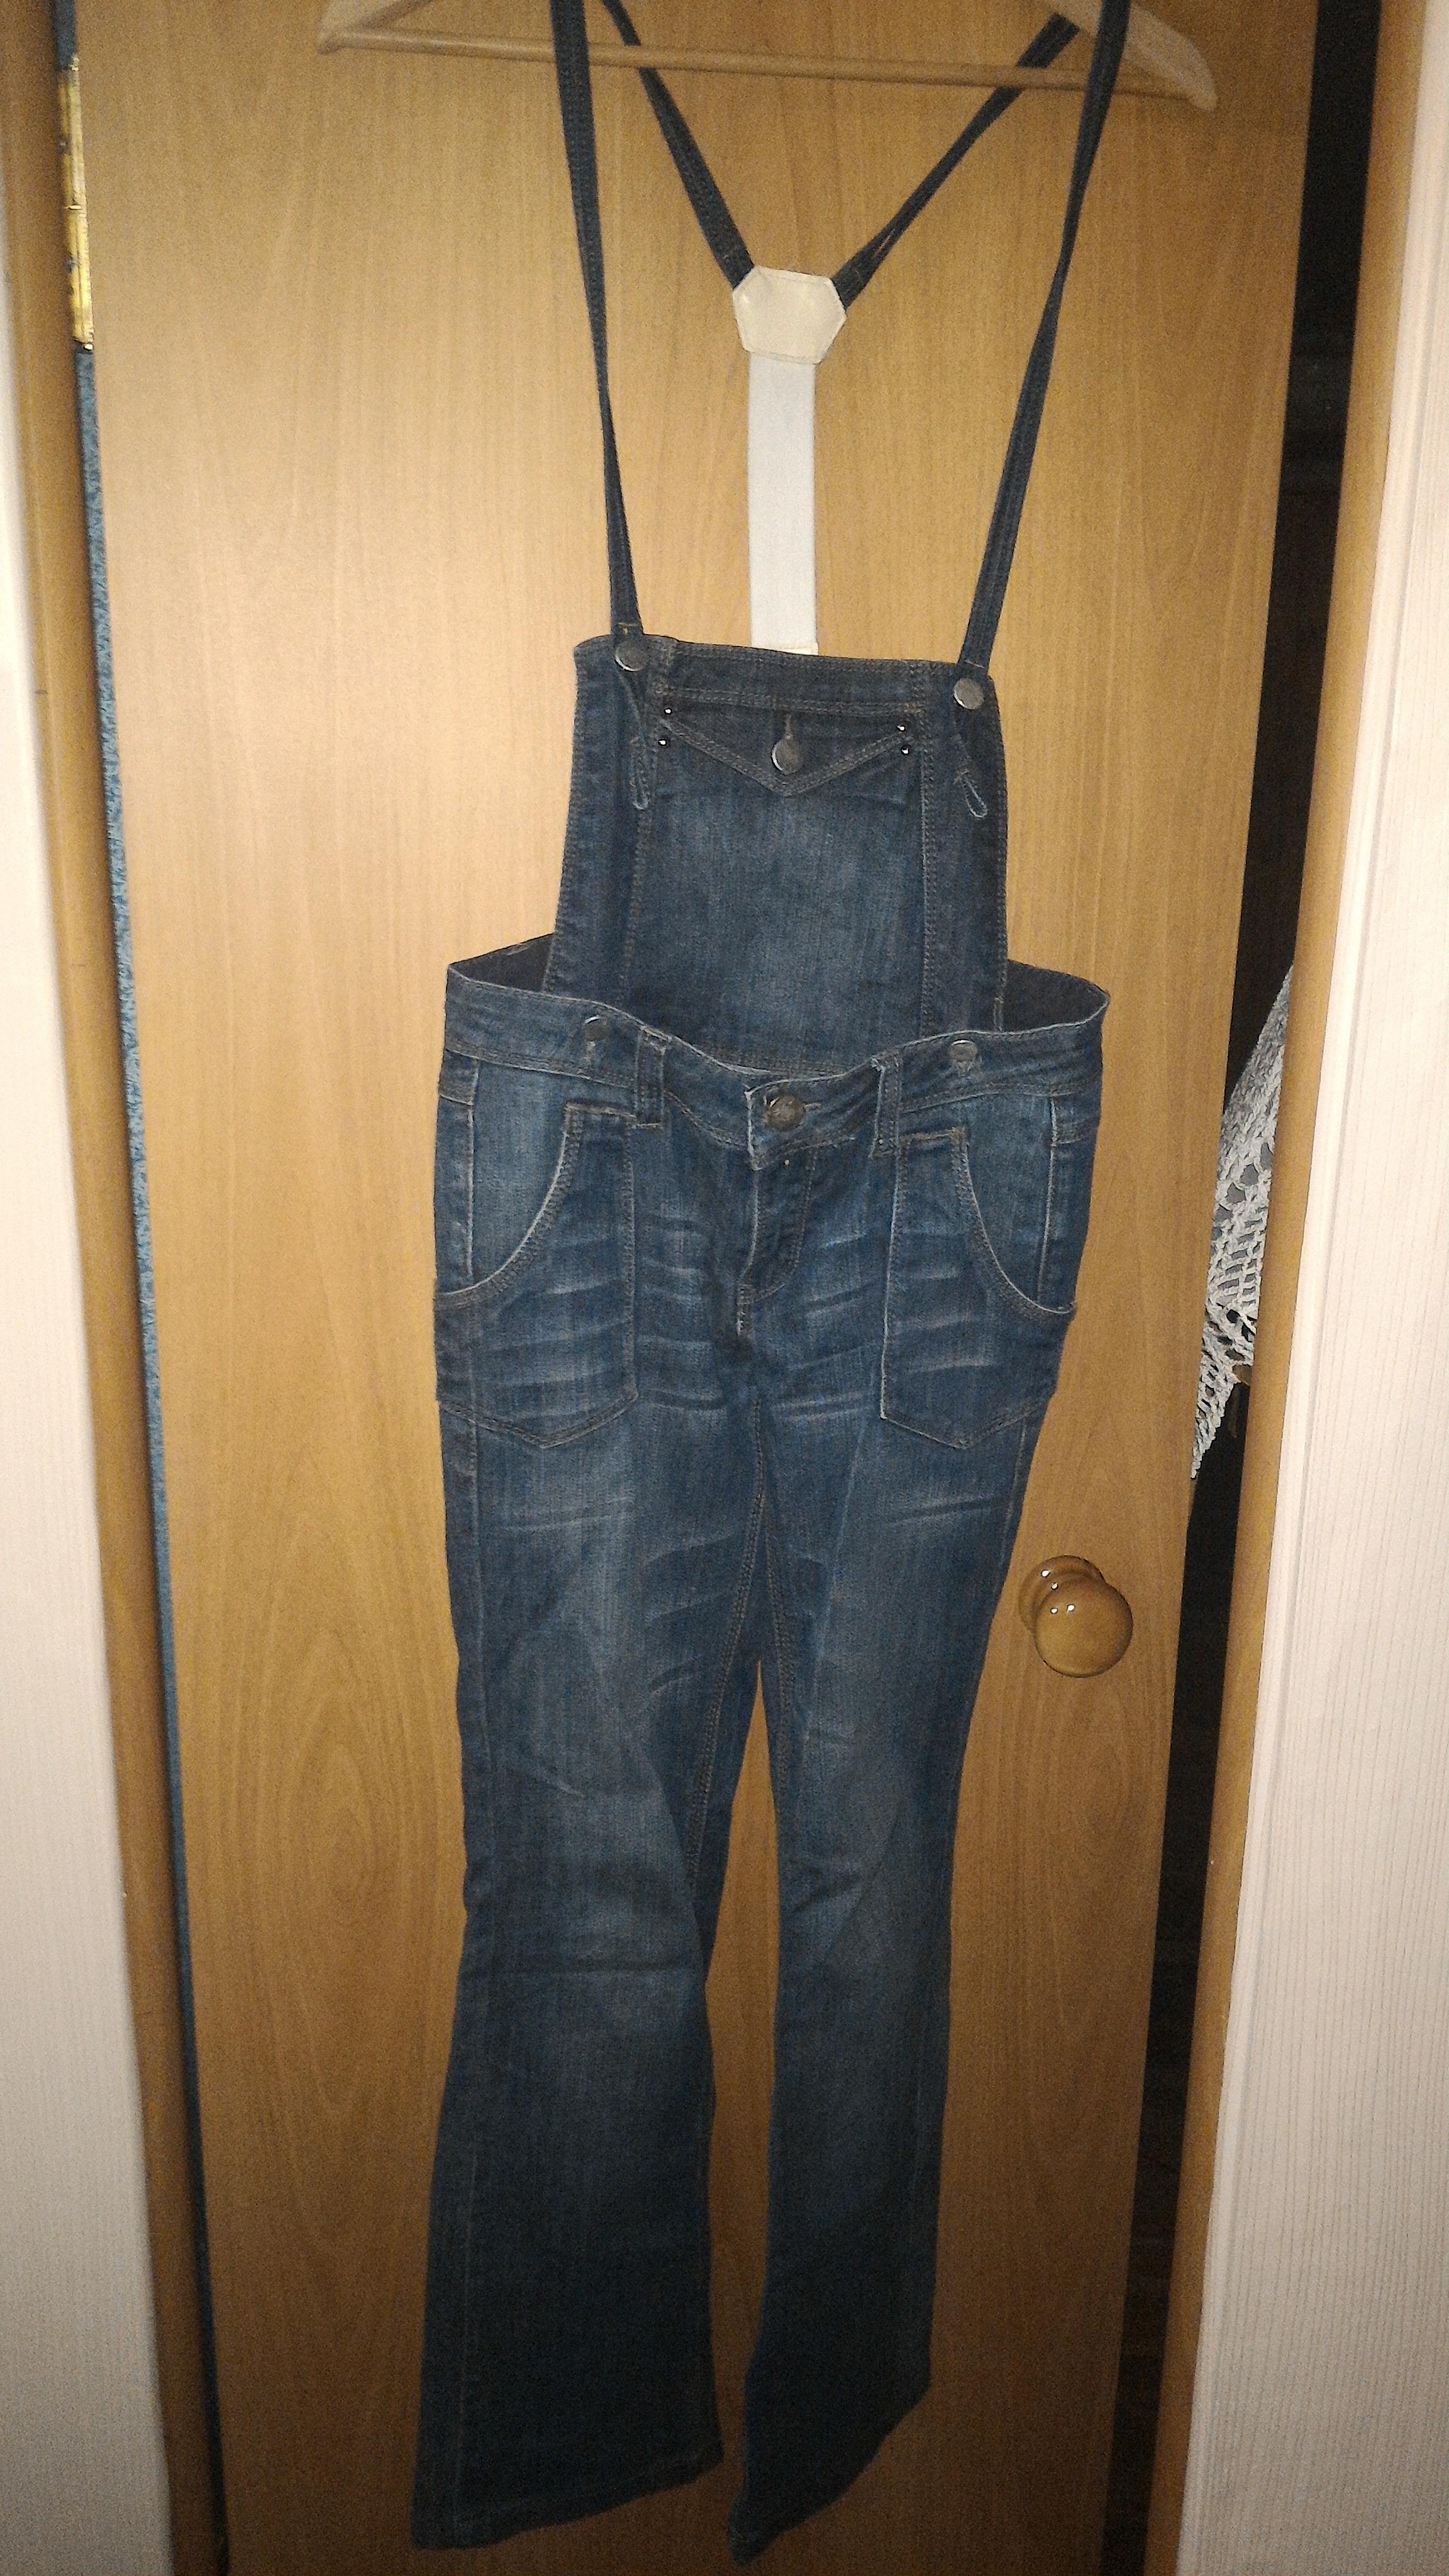 Одежда маркет спб